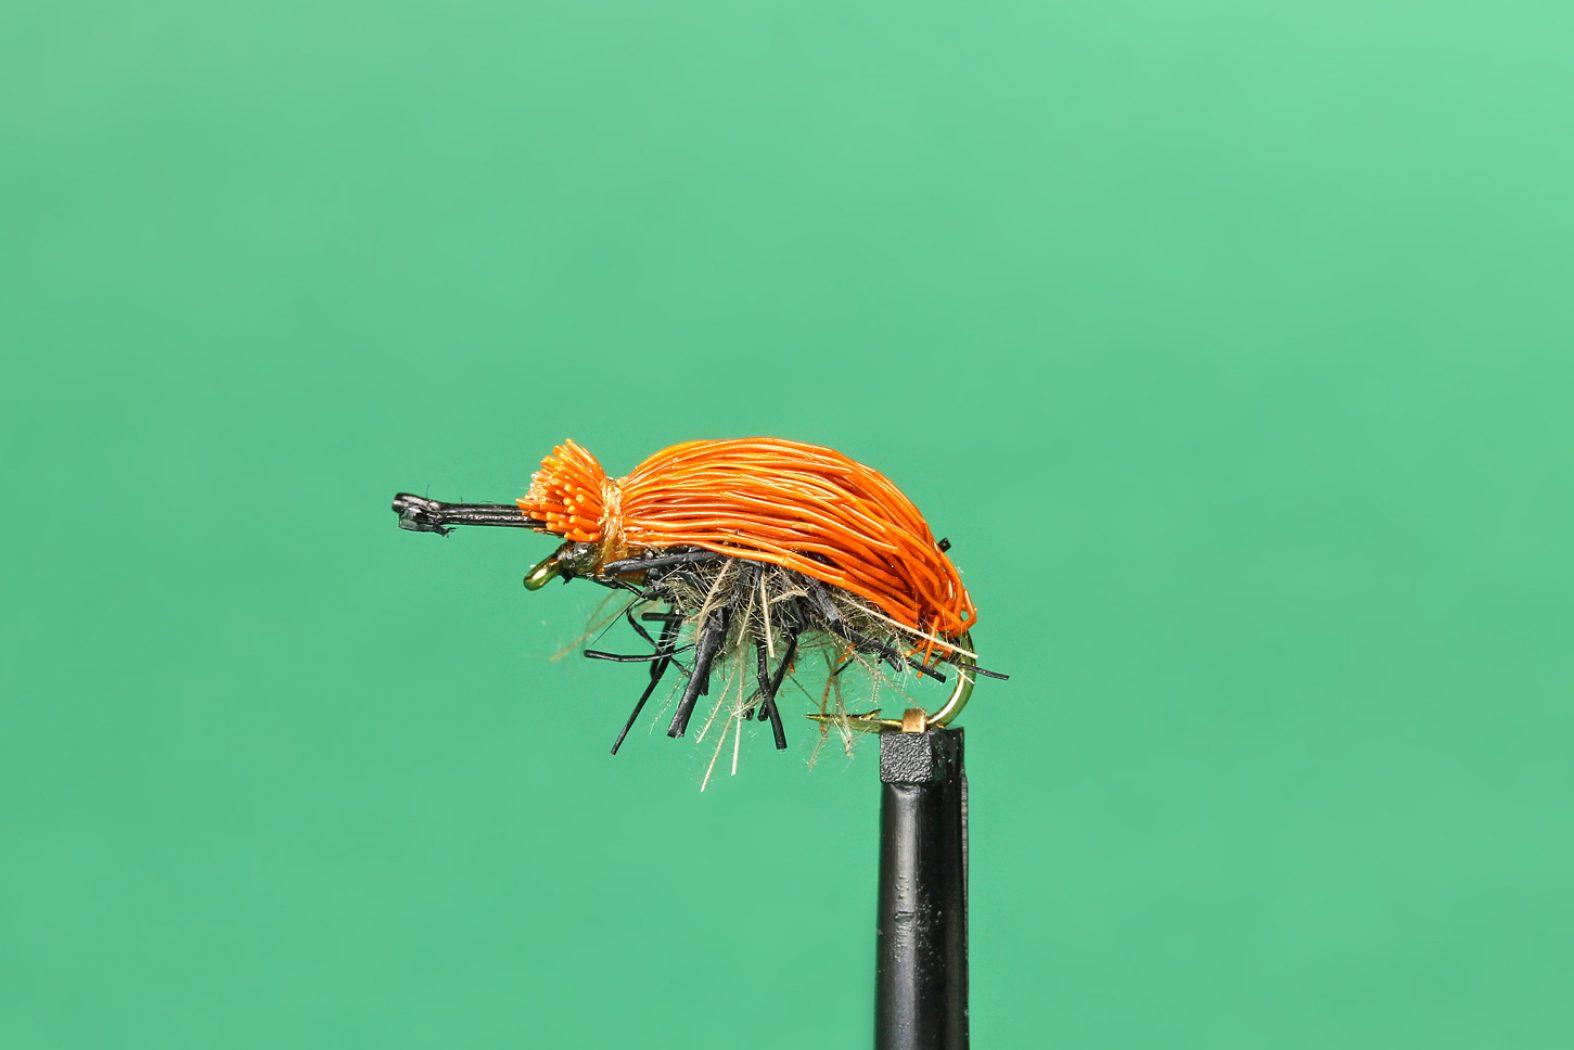 Käfer als Trockenfliege